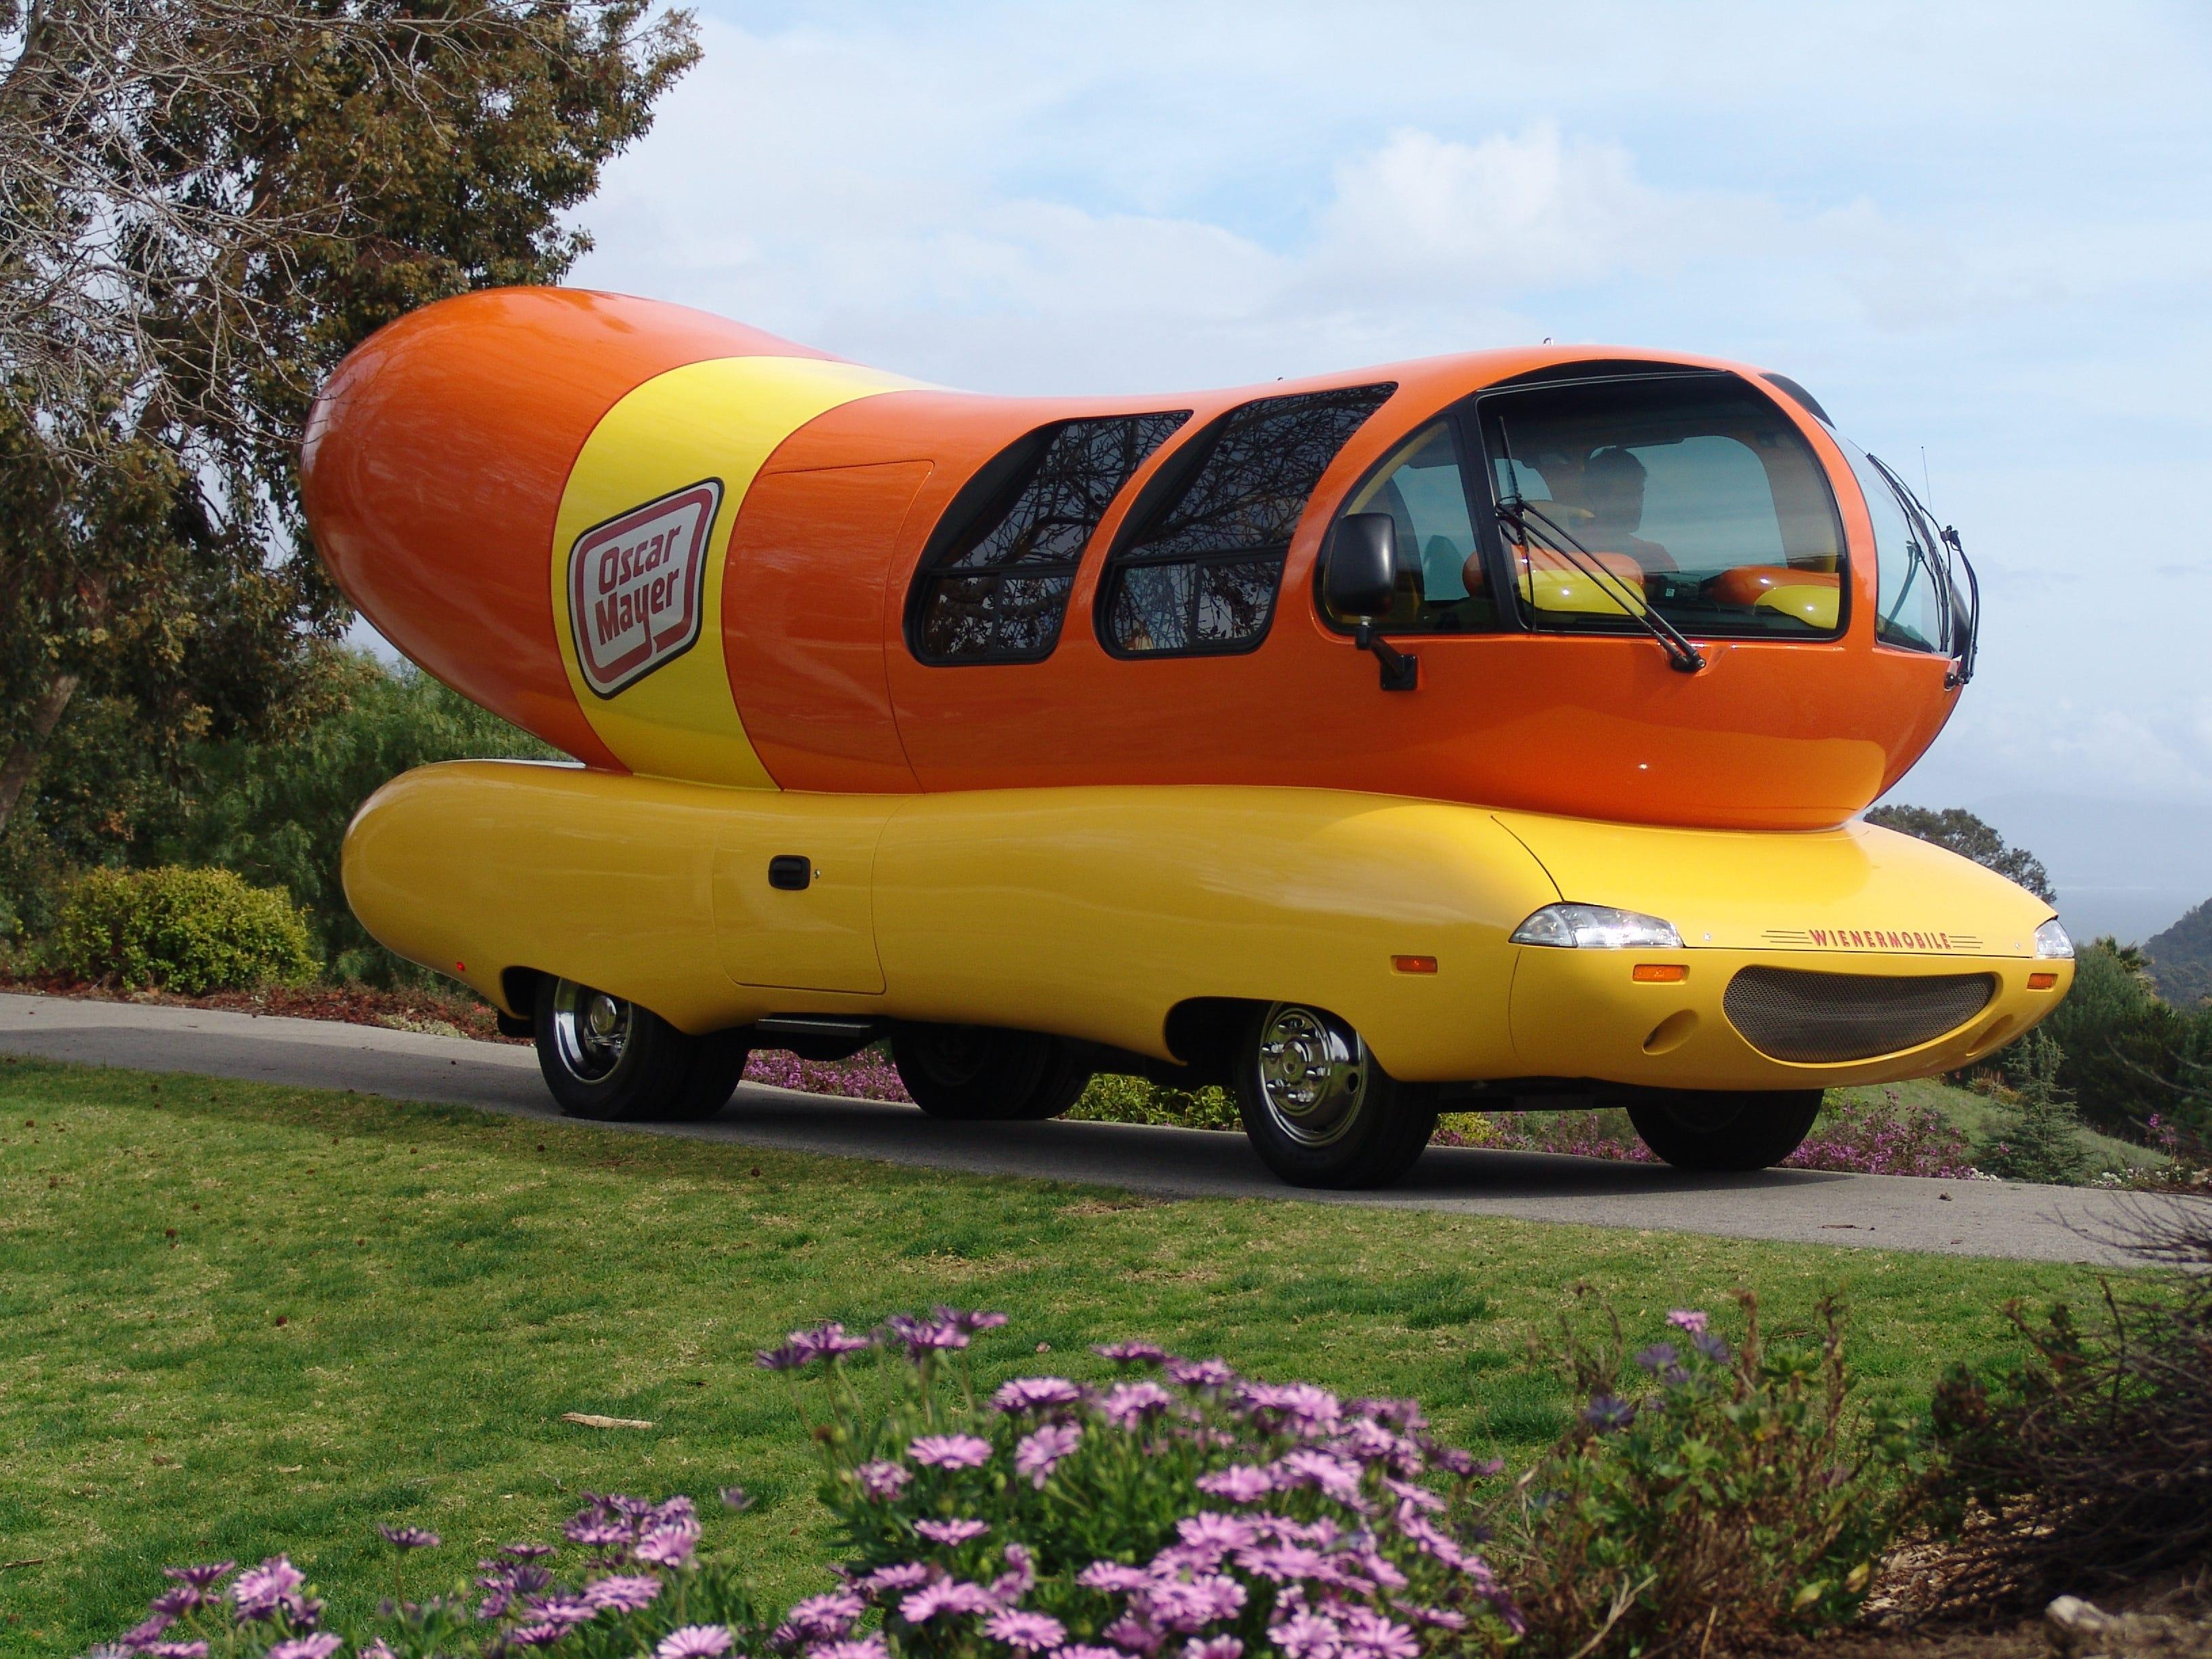 Quick, back to the Oscar Mayer Wienermobile, Robin   Mark Hinson